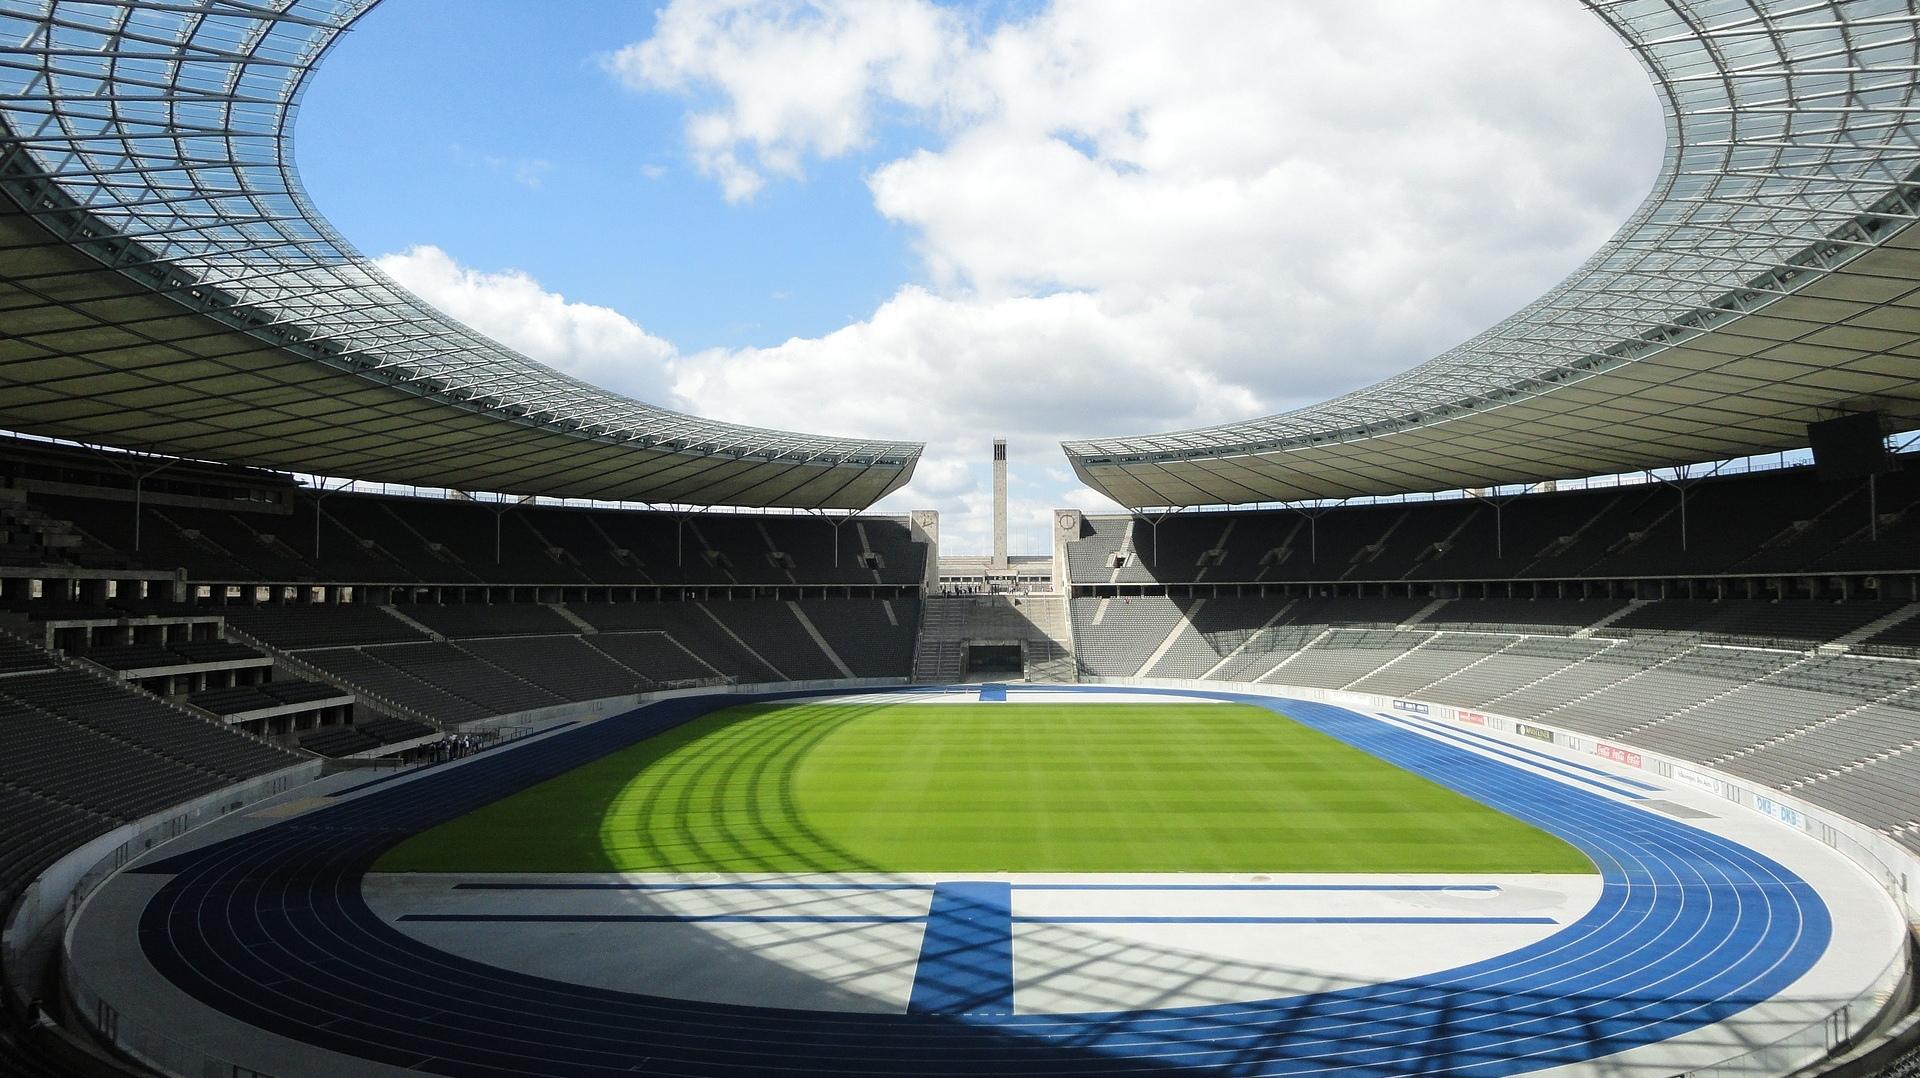 Одбор Народне странке за спорт: Уместо скупог стадиона, фискултурне сале и здравствене установе